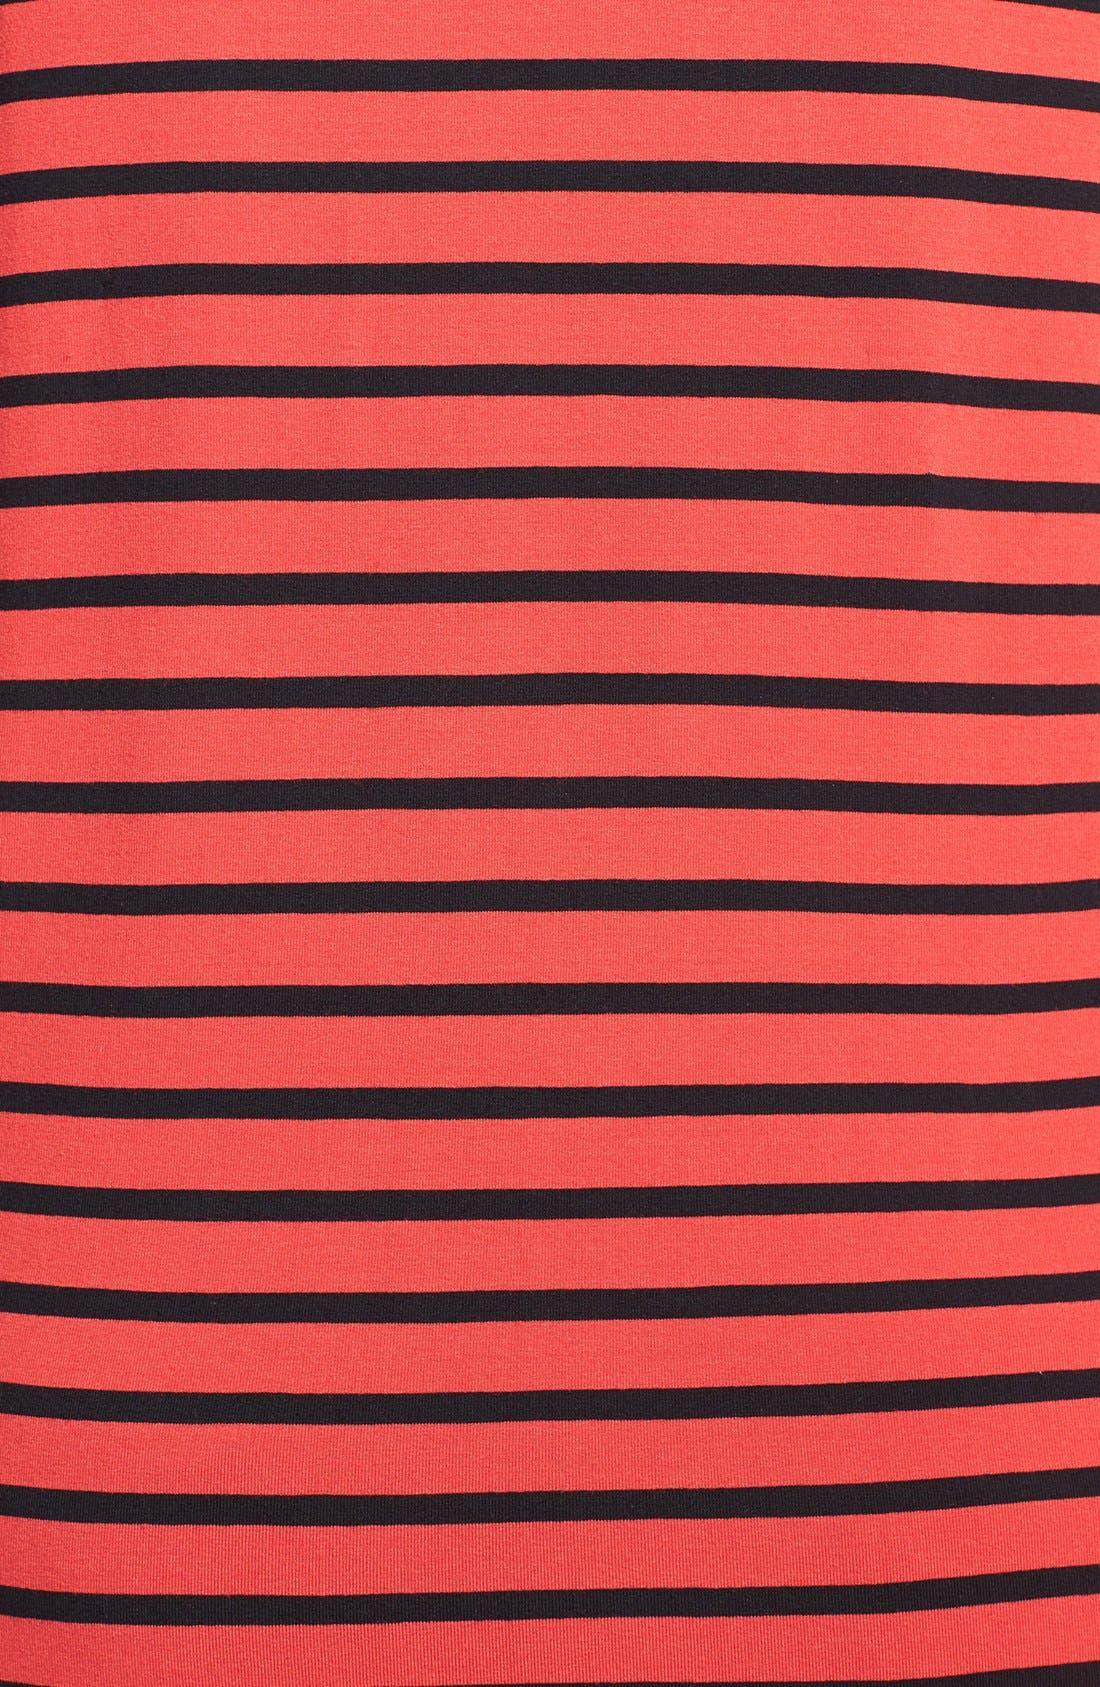 Alternate Image 3  - Vince Camuto 'Retro Stripes' Asymmetrical Tunic (Plus Size)